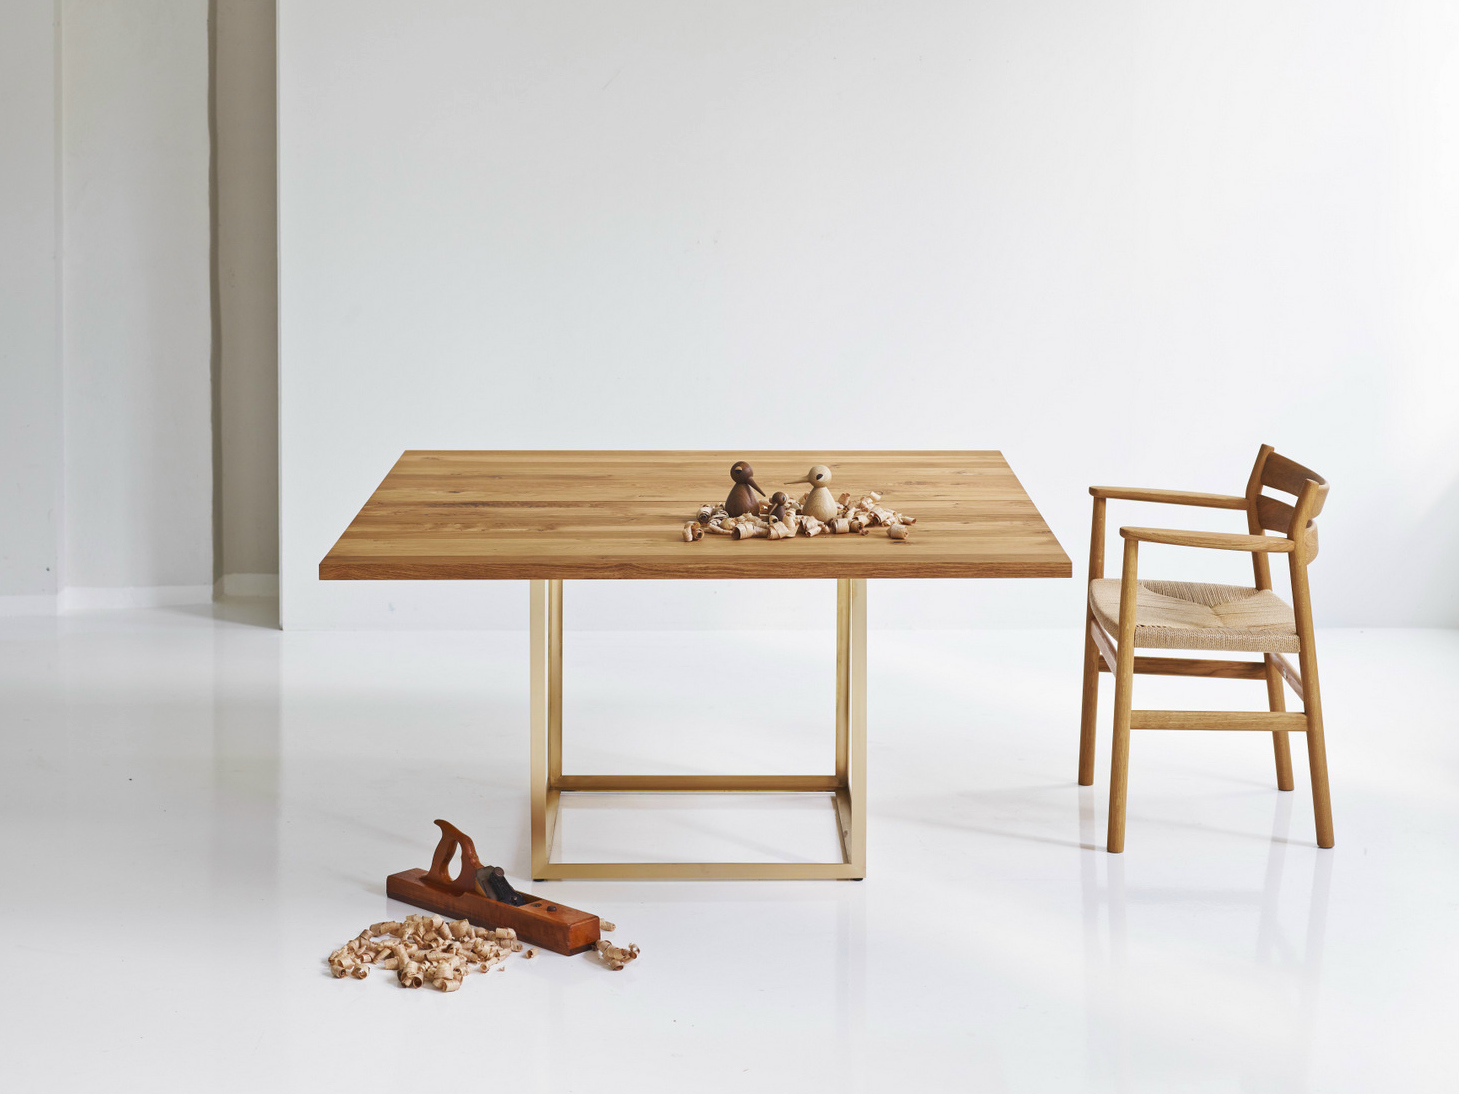 Jewel table tavolo quadrato by dk3 design s ren juul - Tavolo quadrato allungabile design ...